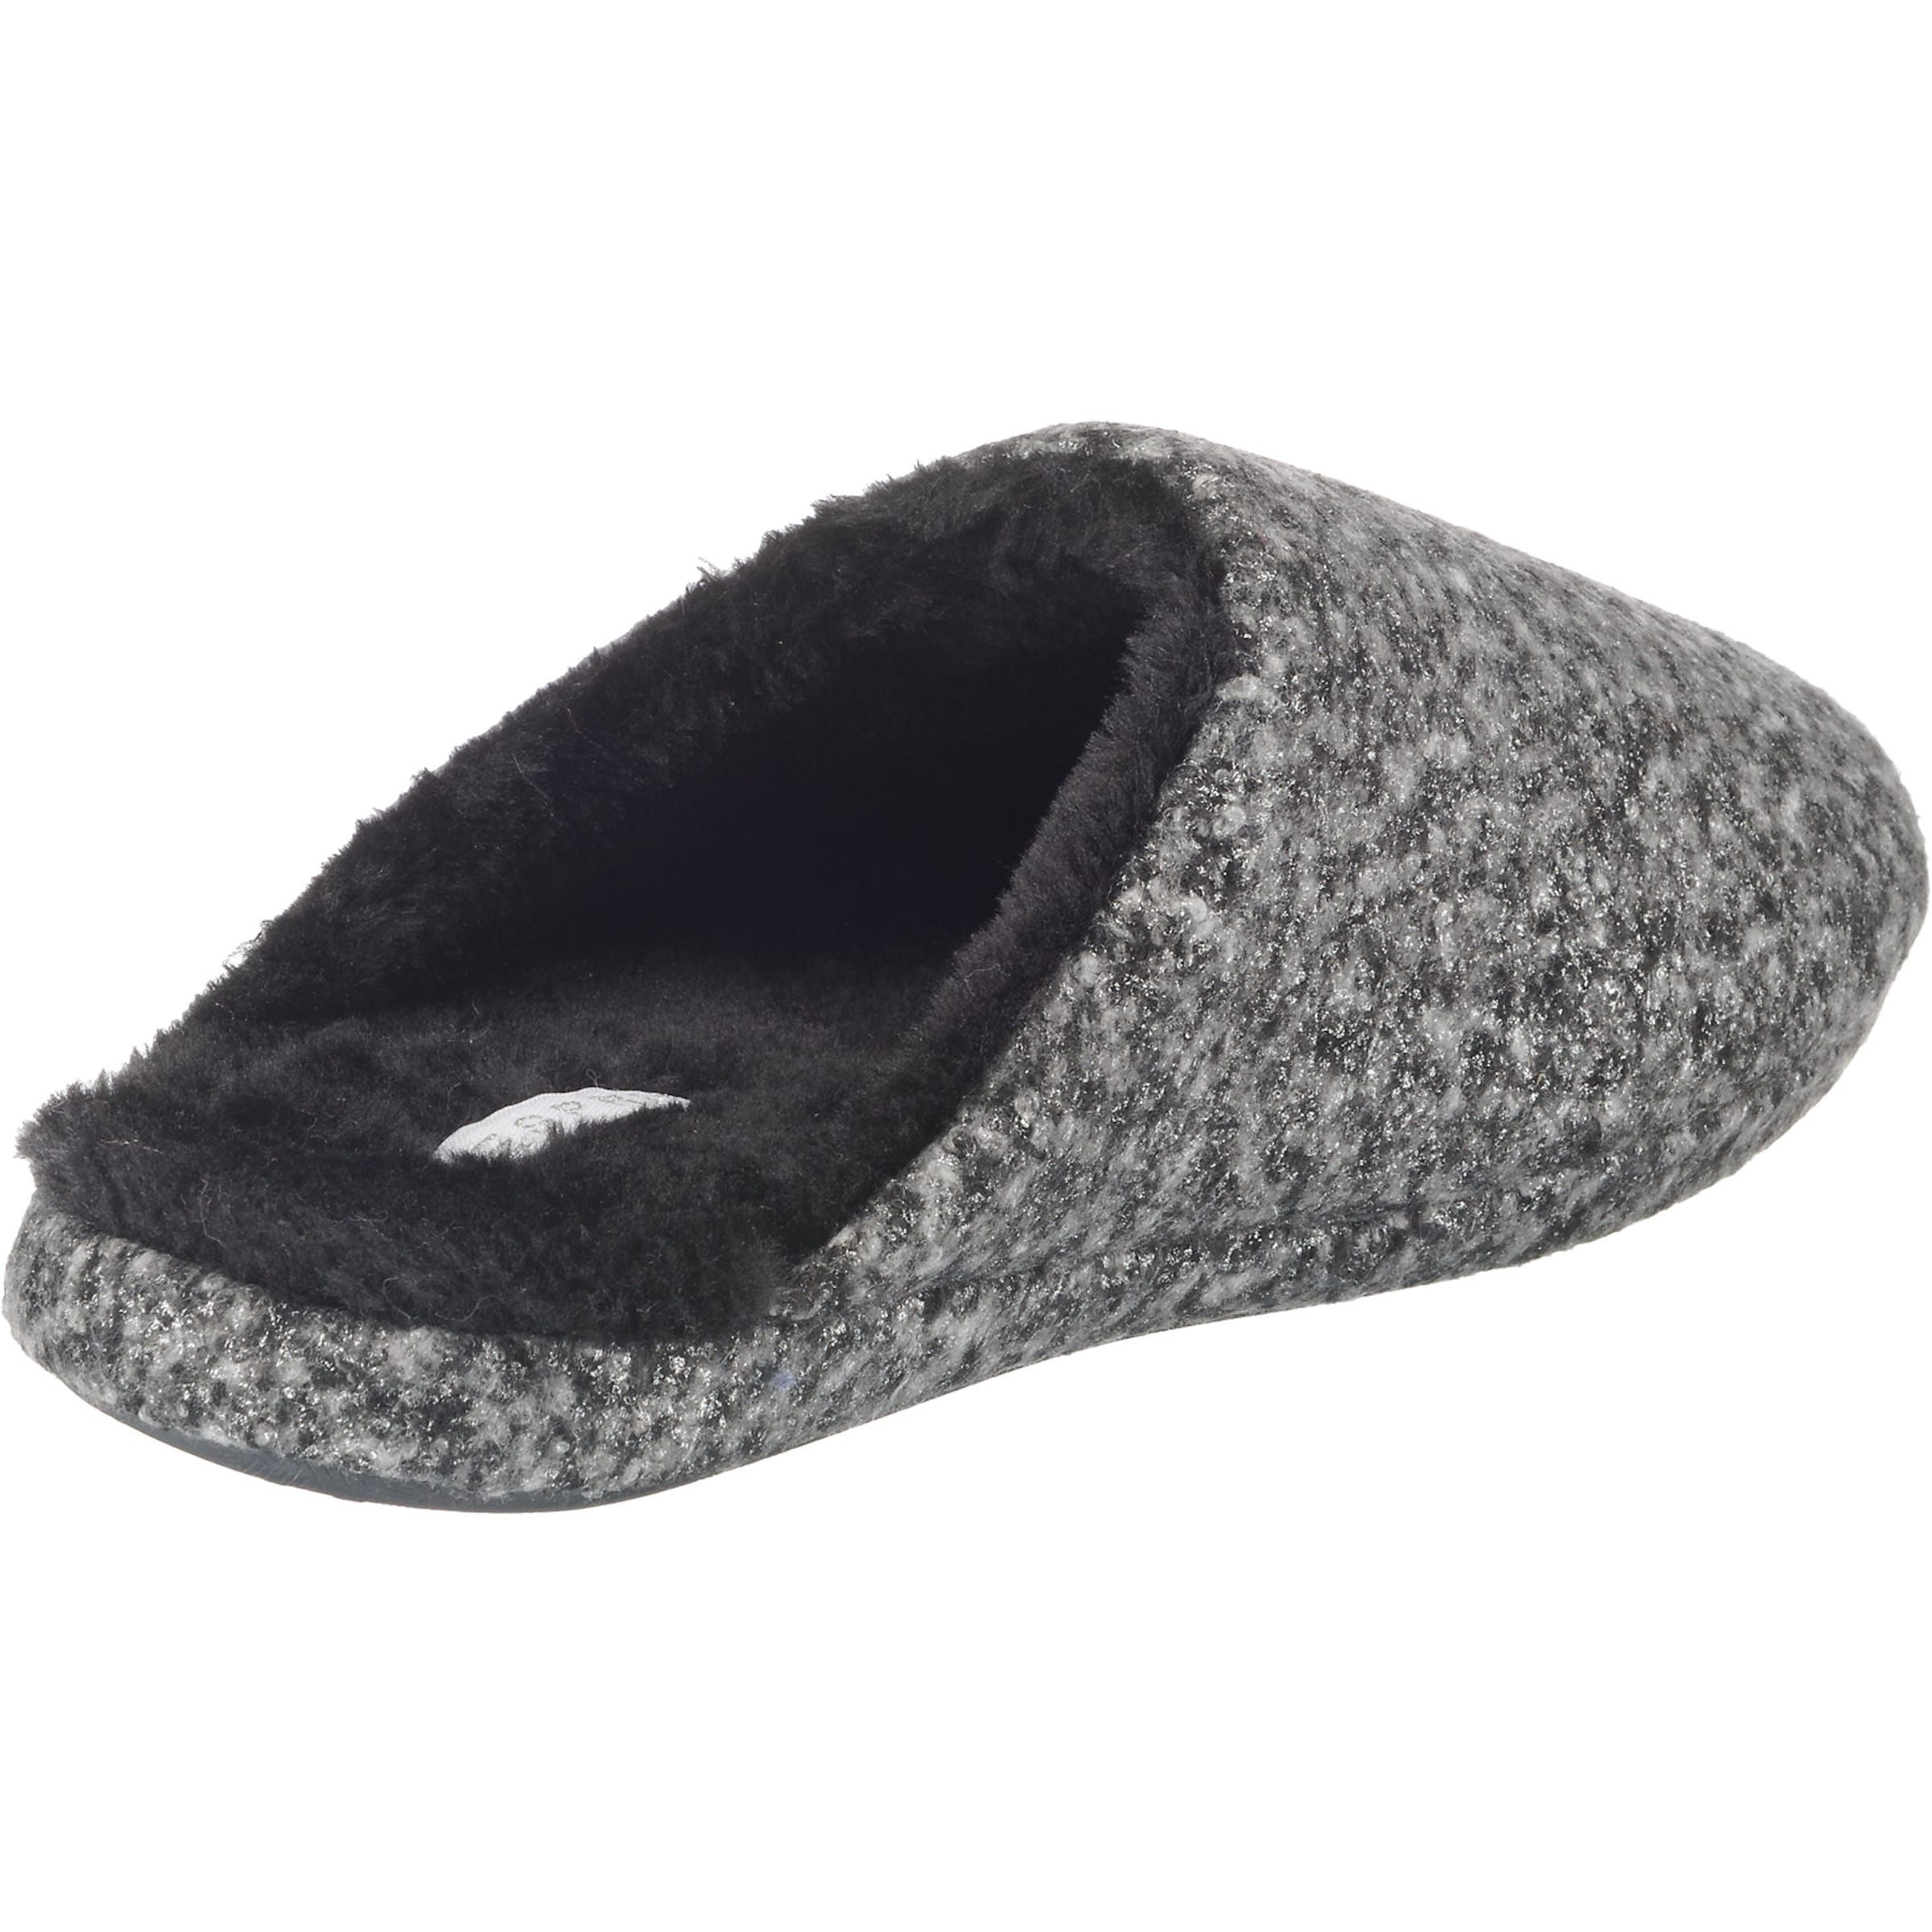 'doni' Schwarzmeliert Pantoffeln Esprit In HellgrauDunkelgrau 53RA4jL